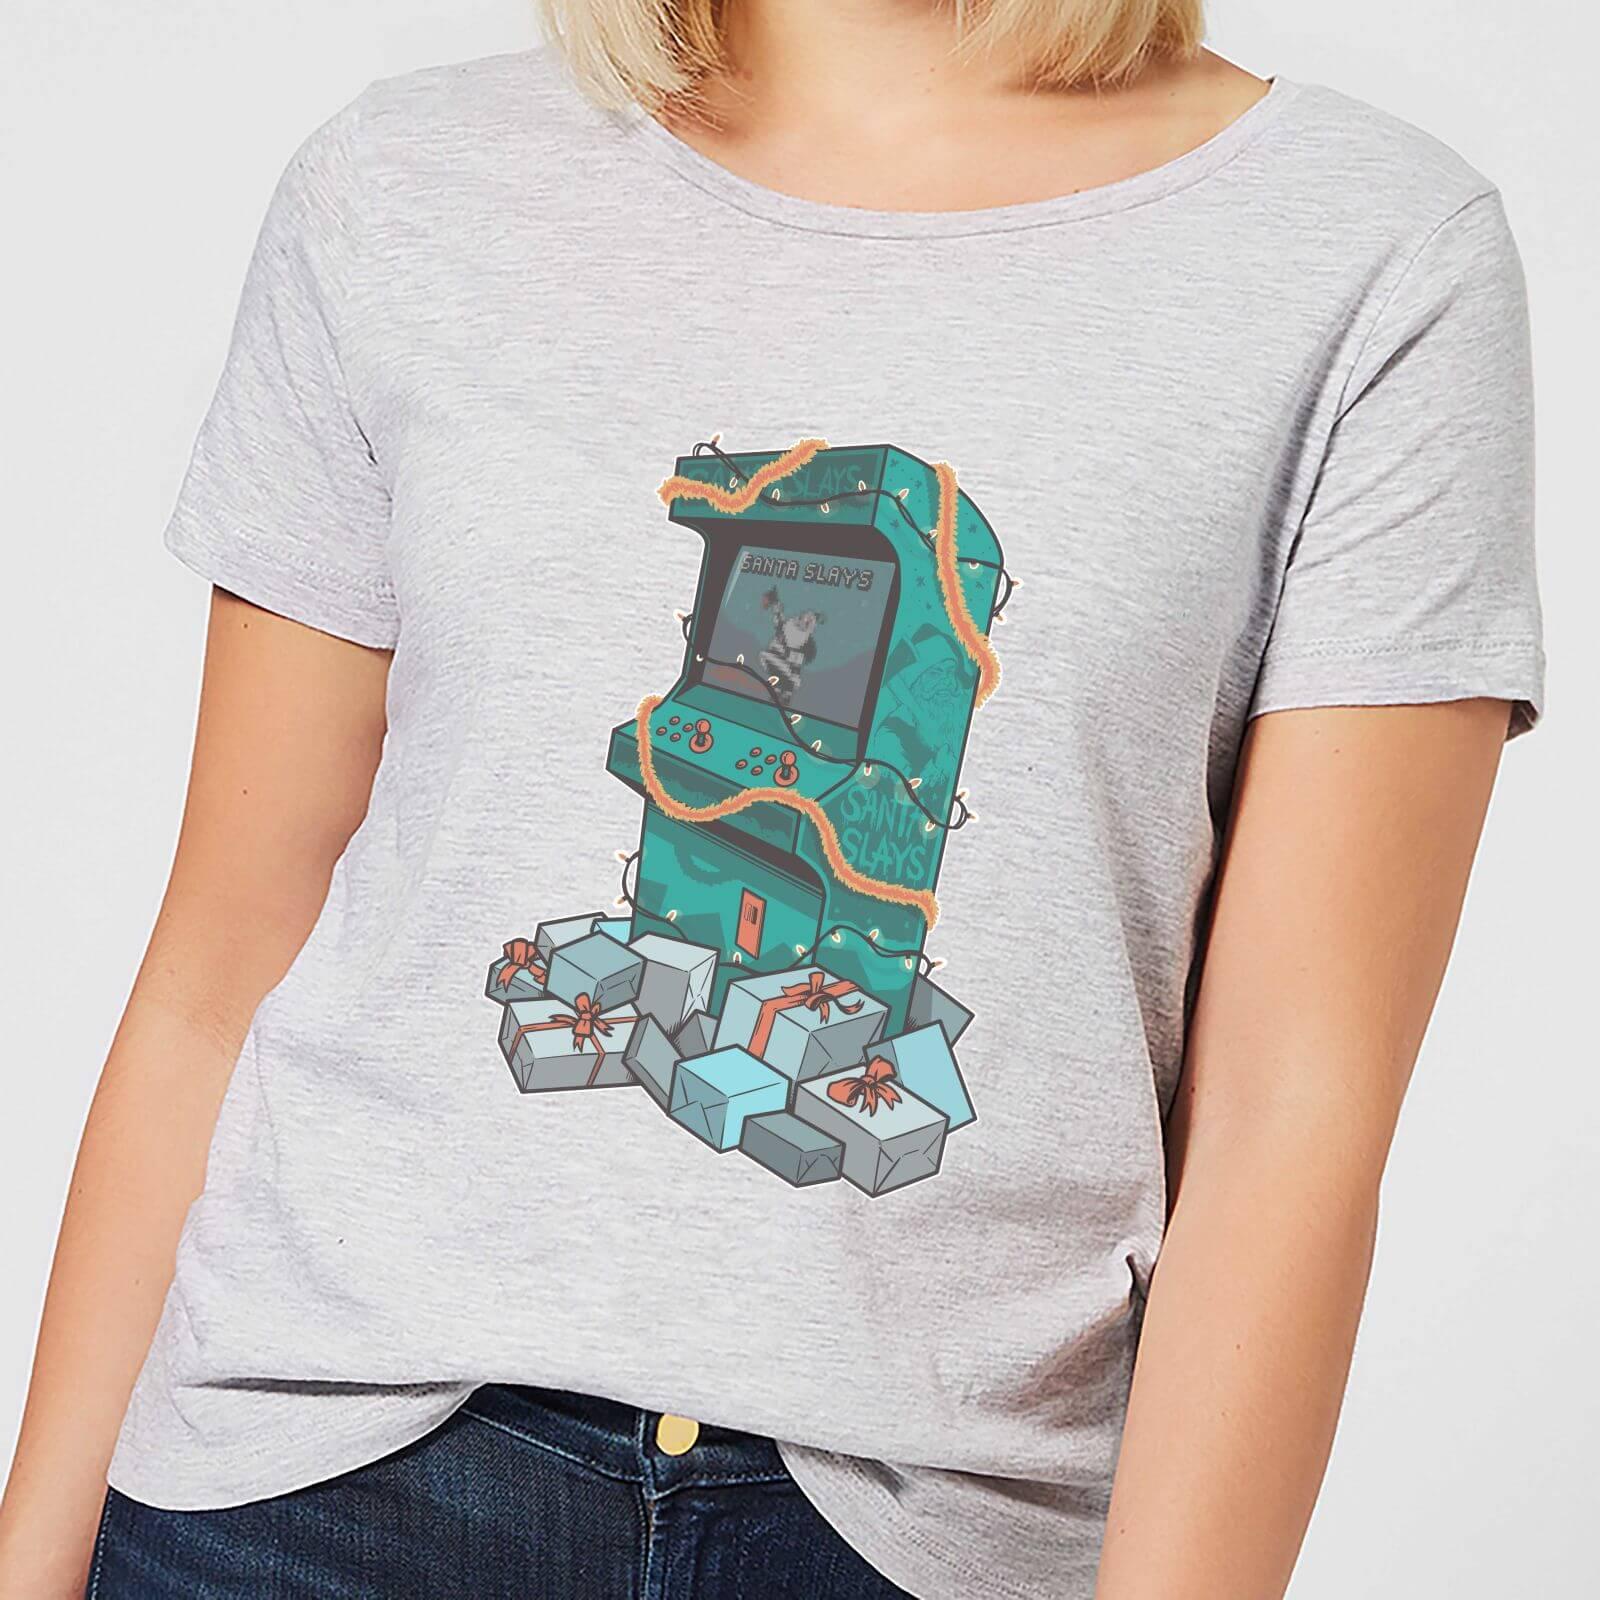 Geek Christmas Arcade Tress Women's T-Shirt - Grey - XS - Grey